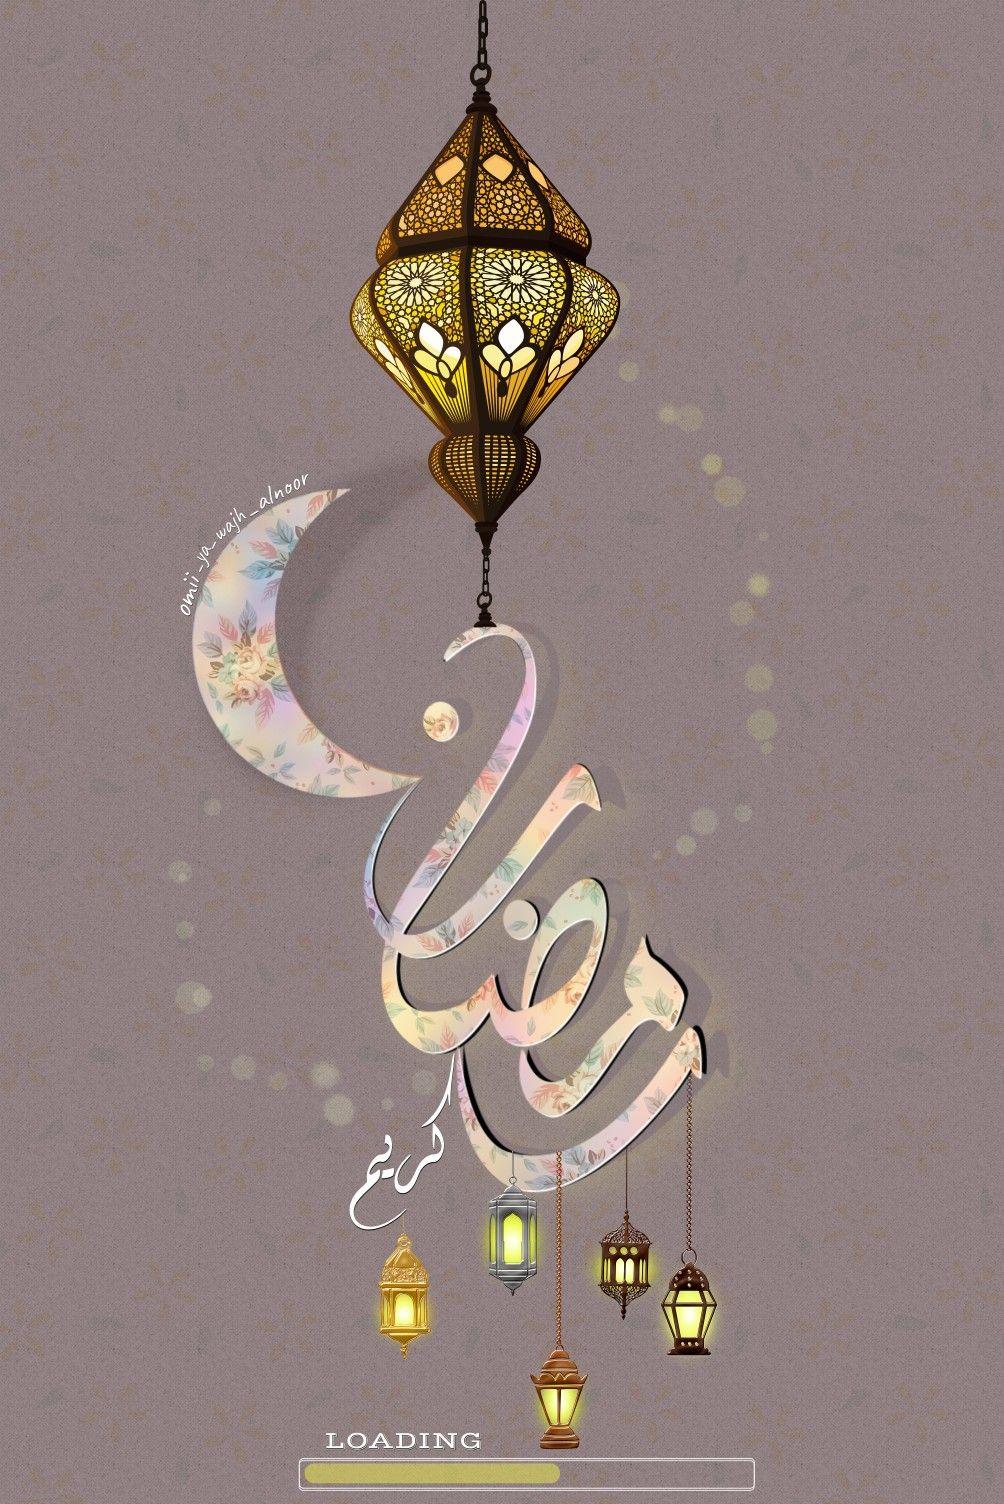 هلال خلفيات رمضان كريم